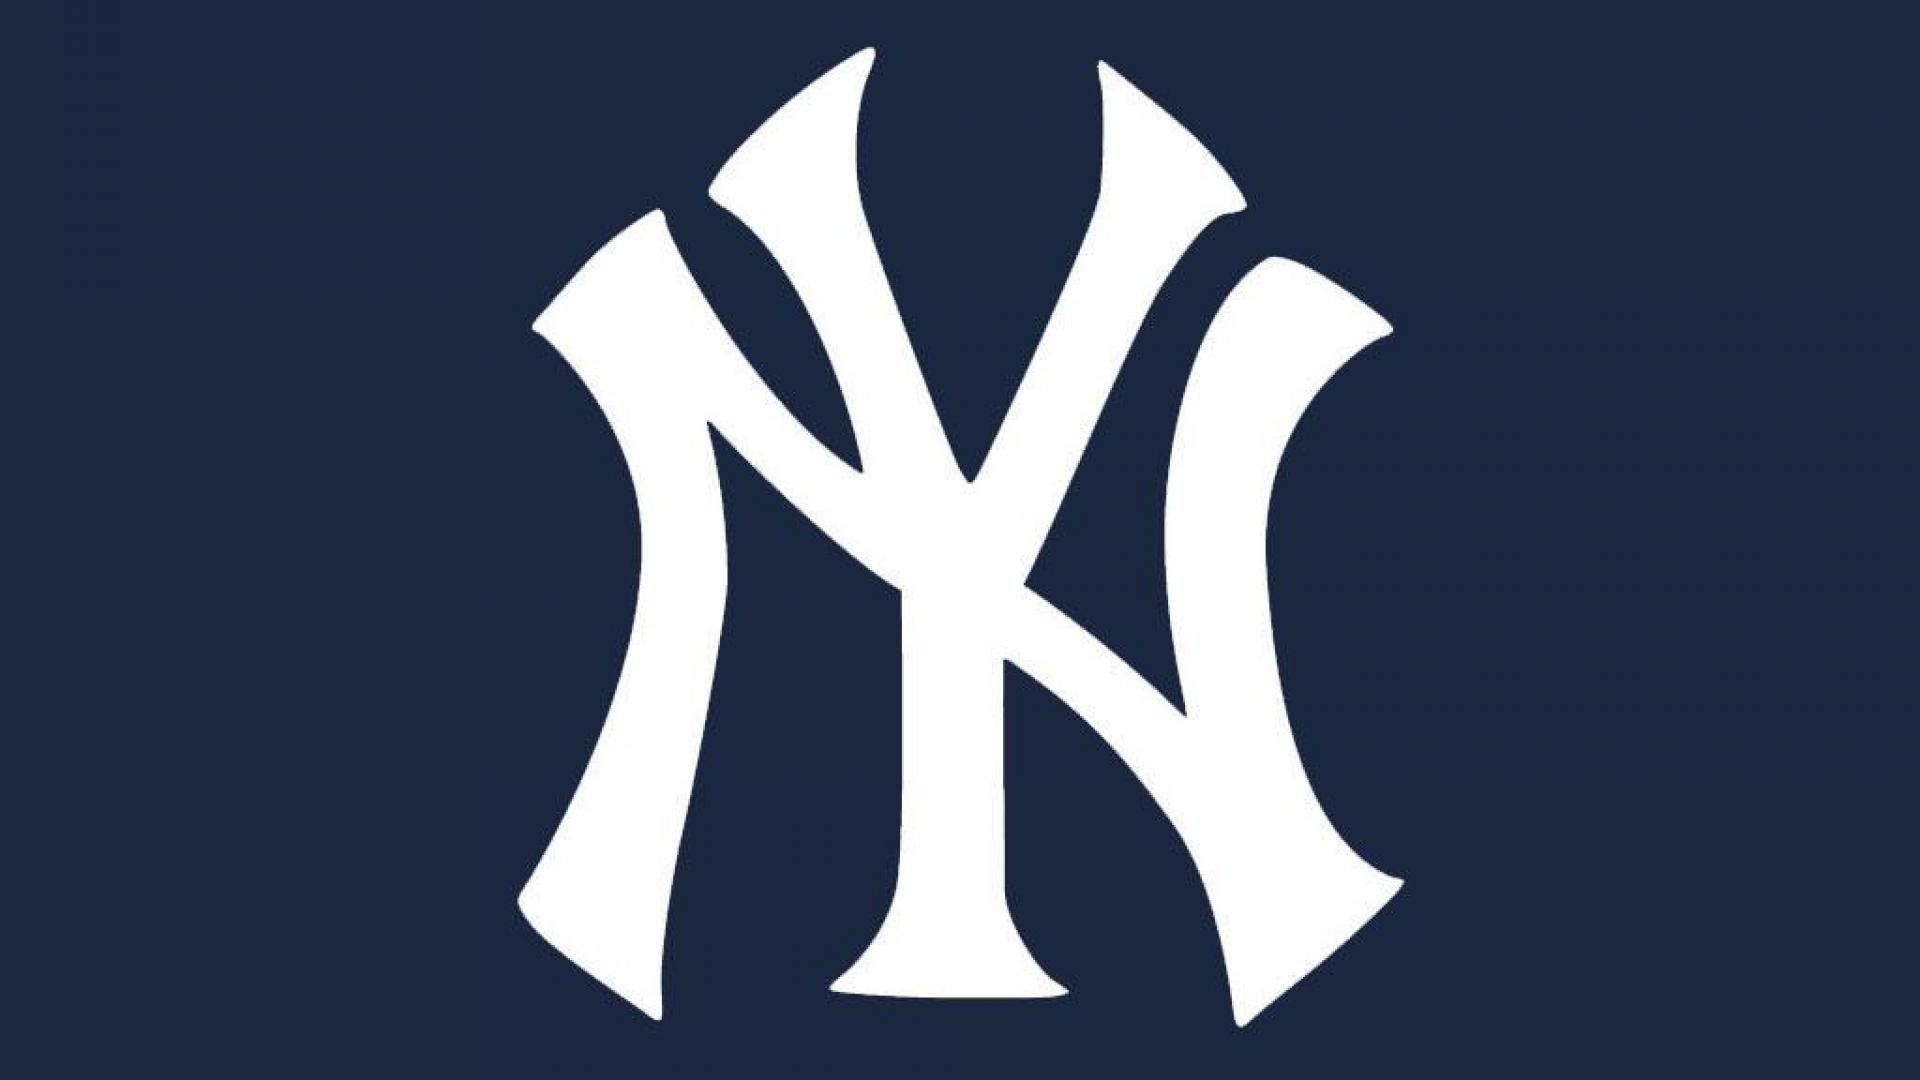 New York Yankees pics